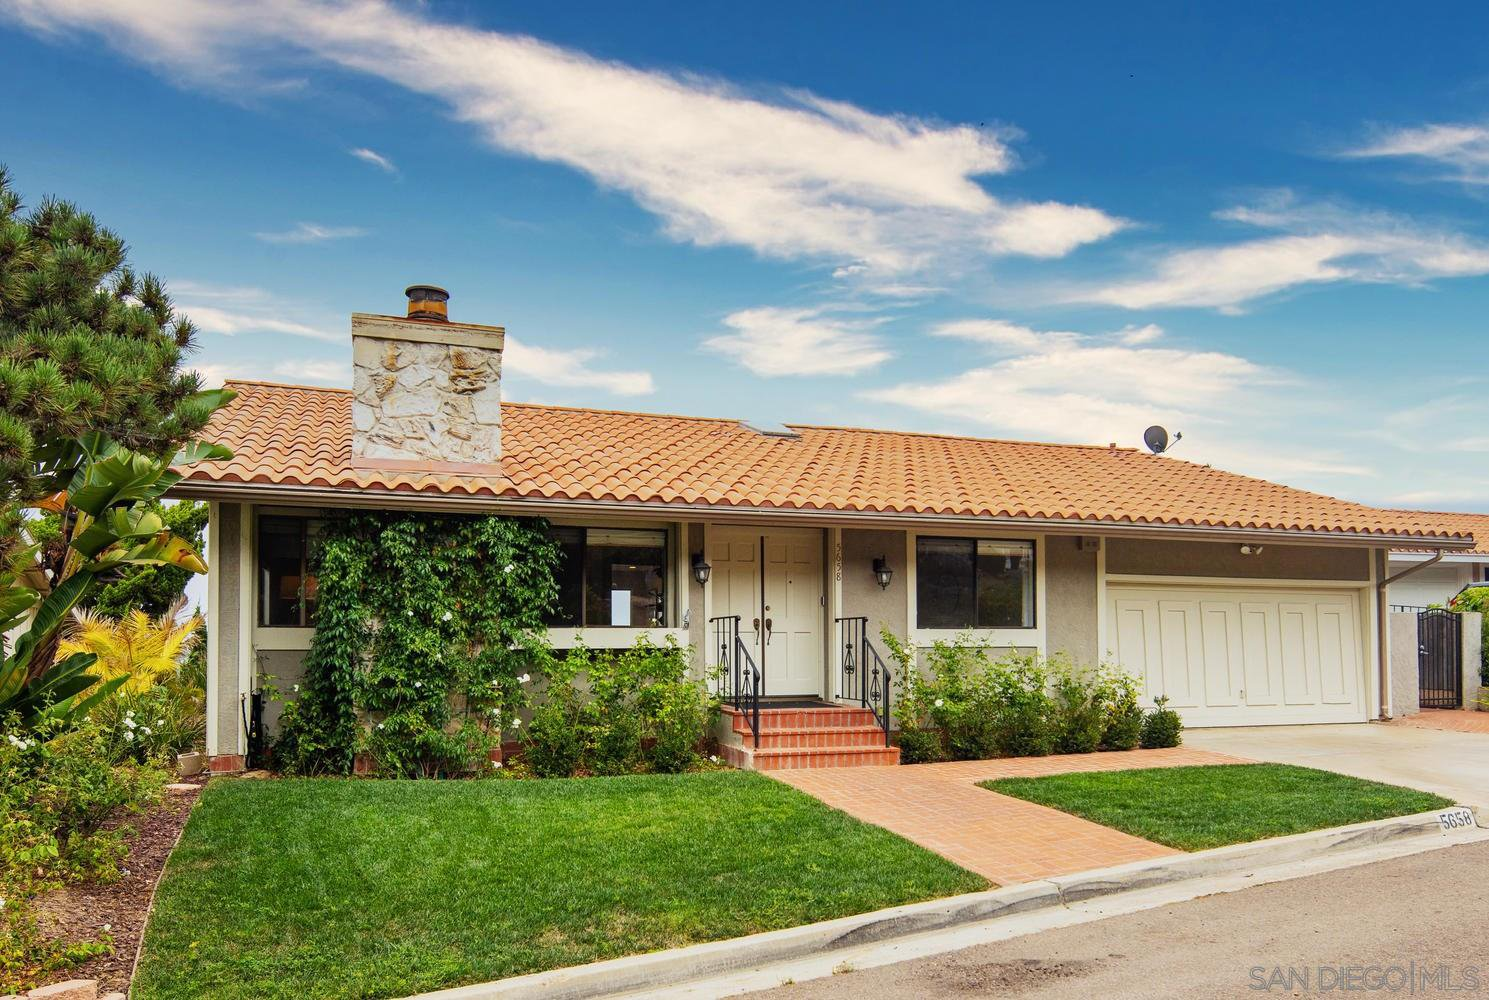 Main Photo: LA JOLLA House for sale : 3 bedrooms : 5658 Desert View Drive